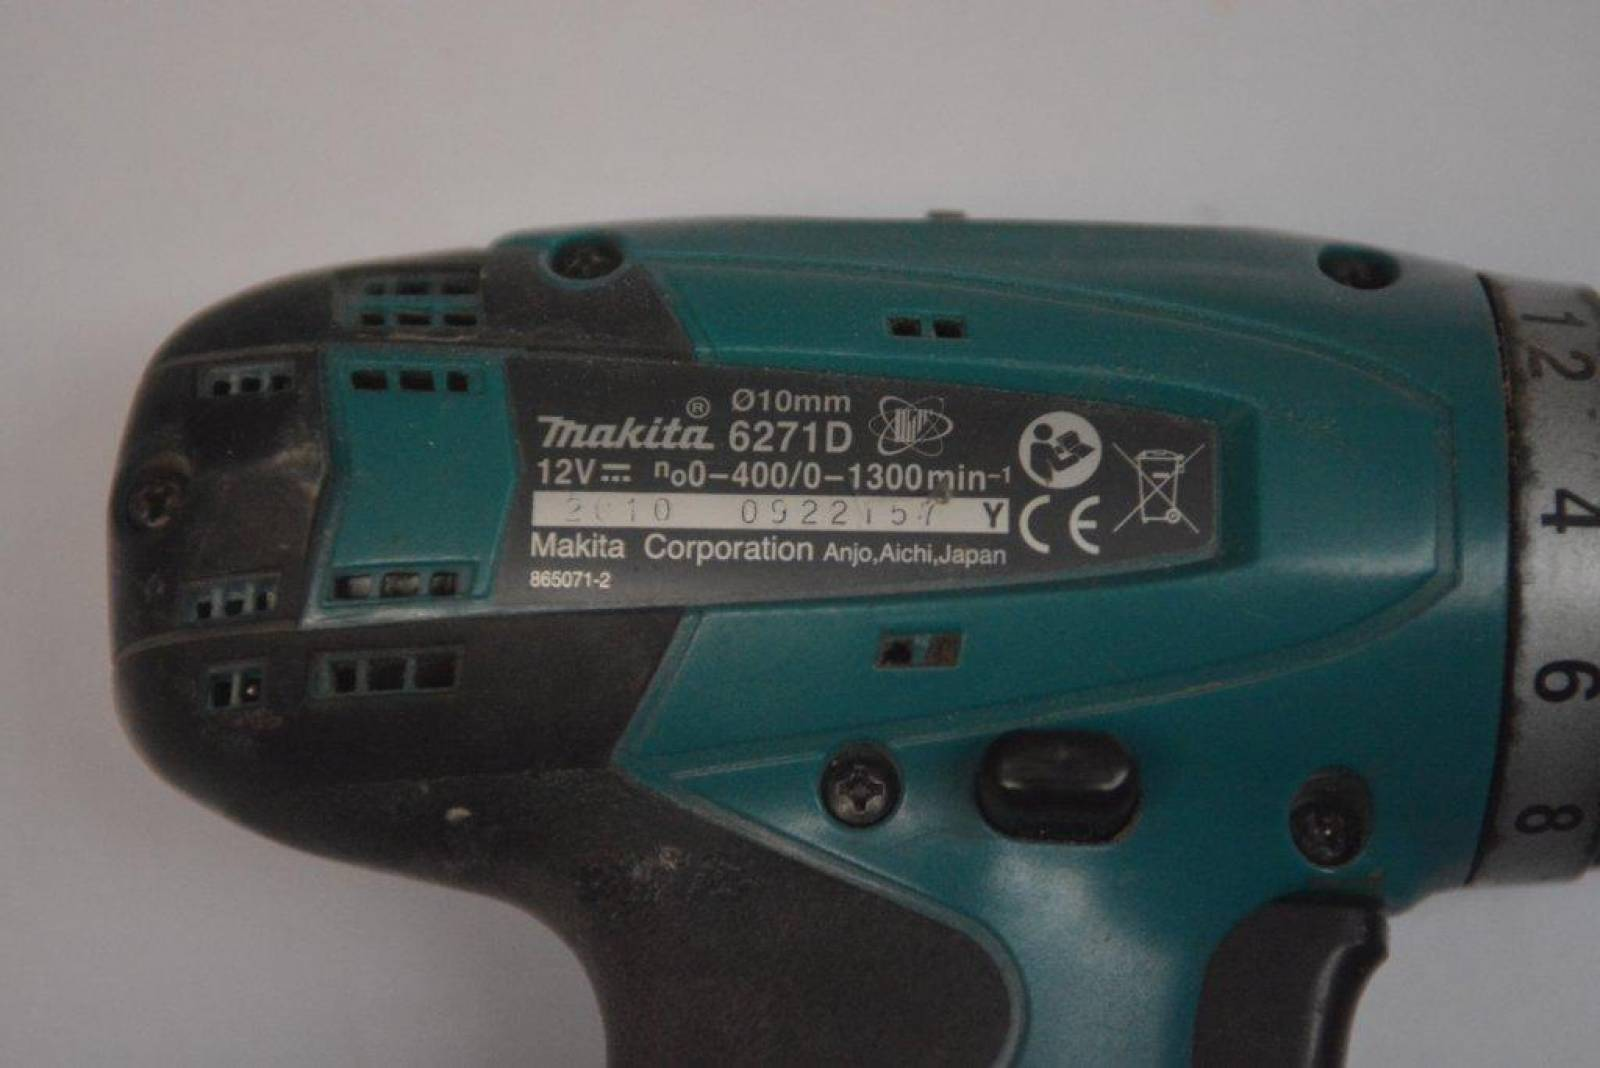 Makita 6271D: device, description, photo 15